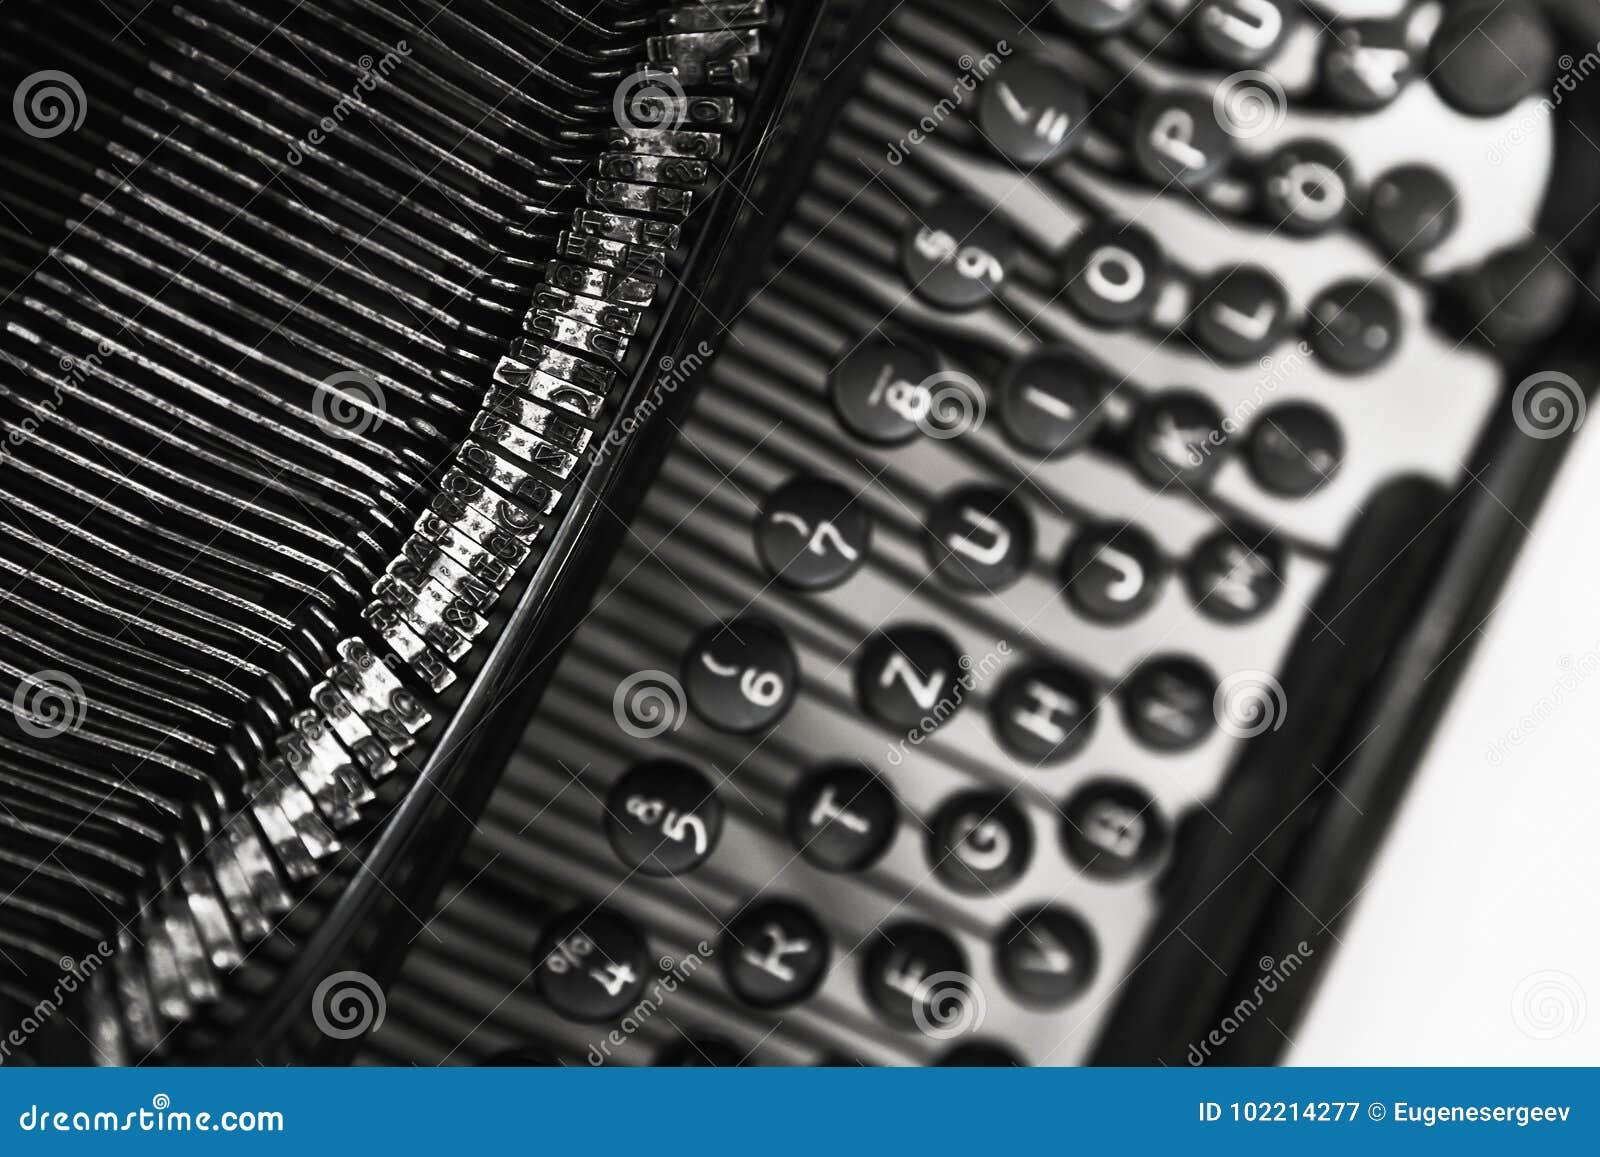 old manual typewriter machine close up stock image image of rh dreamstime com Close Up Lens for Photography Close Up Water Photography